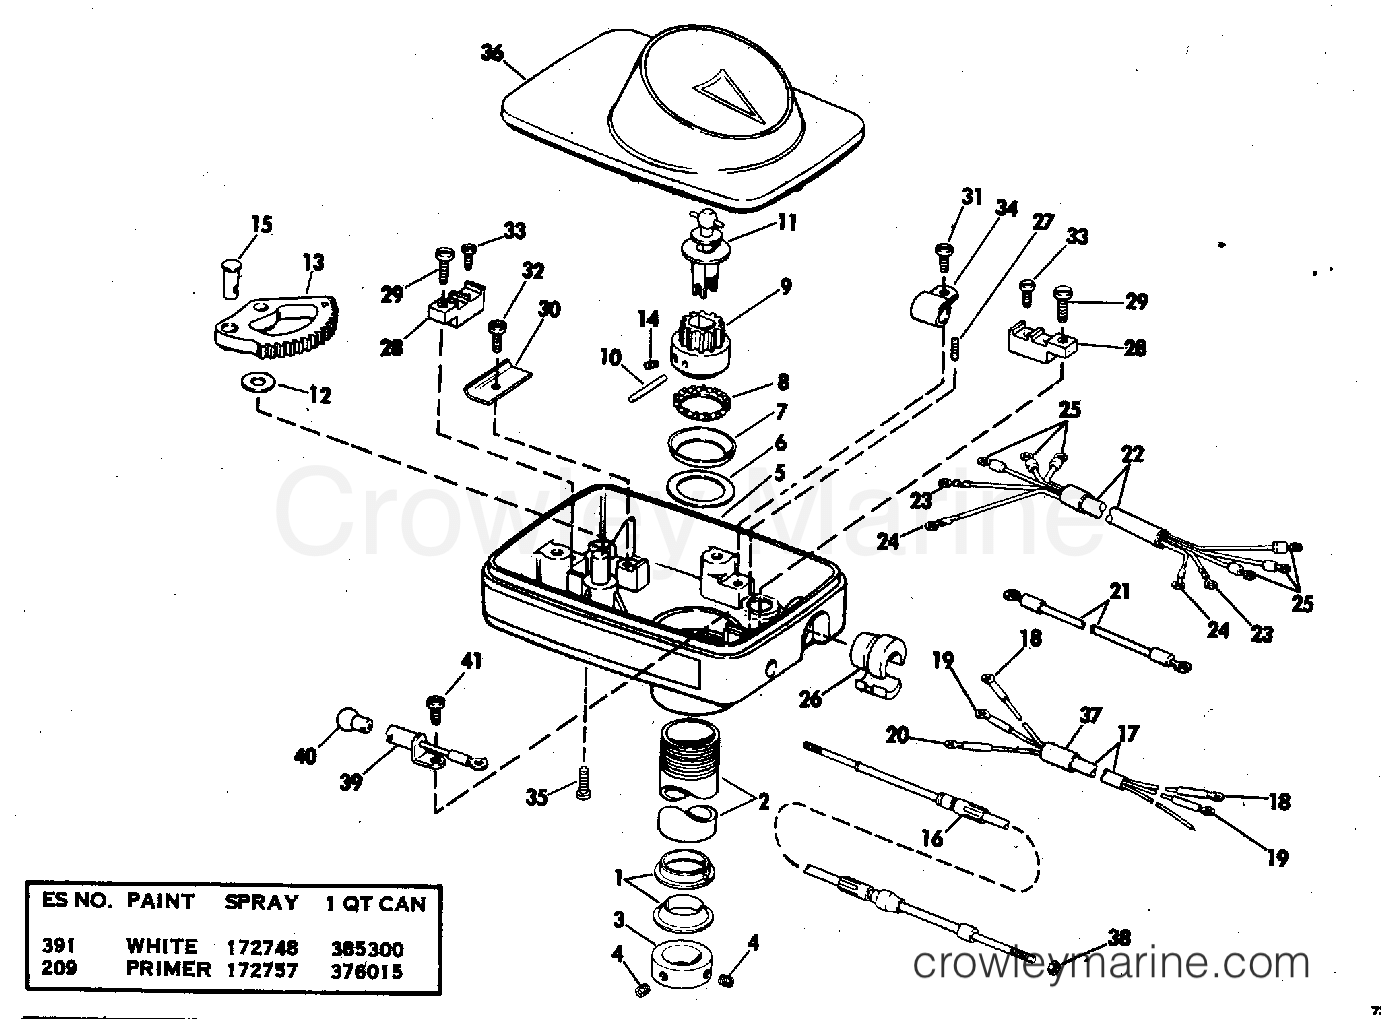 1978 Electric Motors 24 Volt - E48-C - STEERING HOUSING GROUP